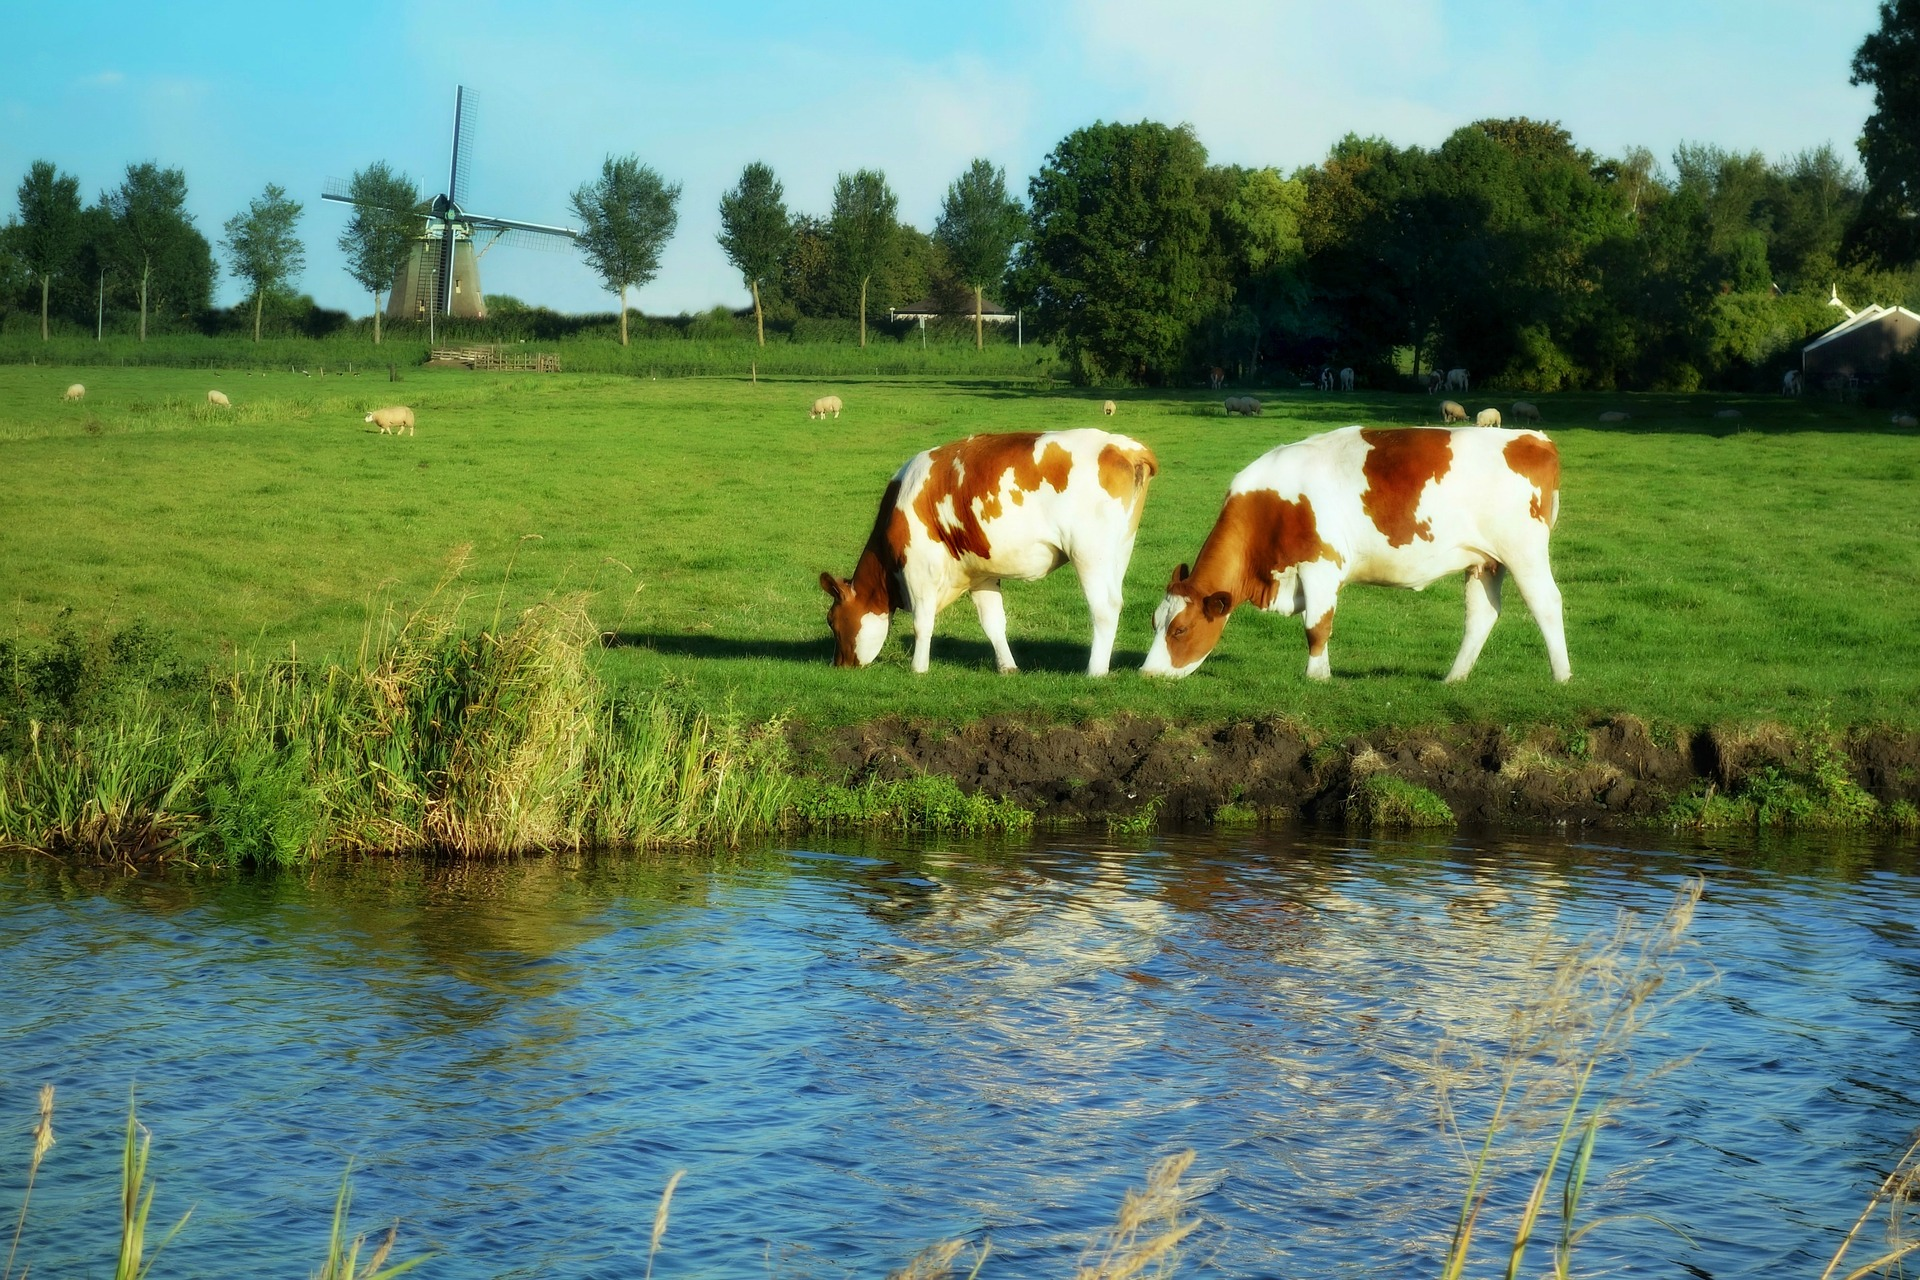 Biogas plant Biddinghuizen Netherlands Planta de Biogás Biddinghuizen 05